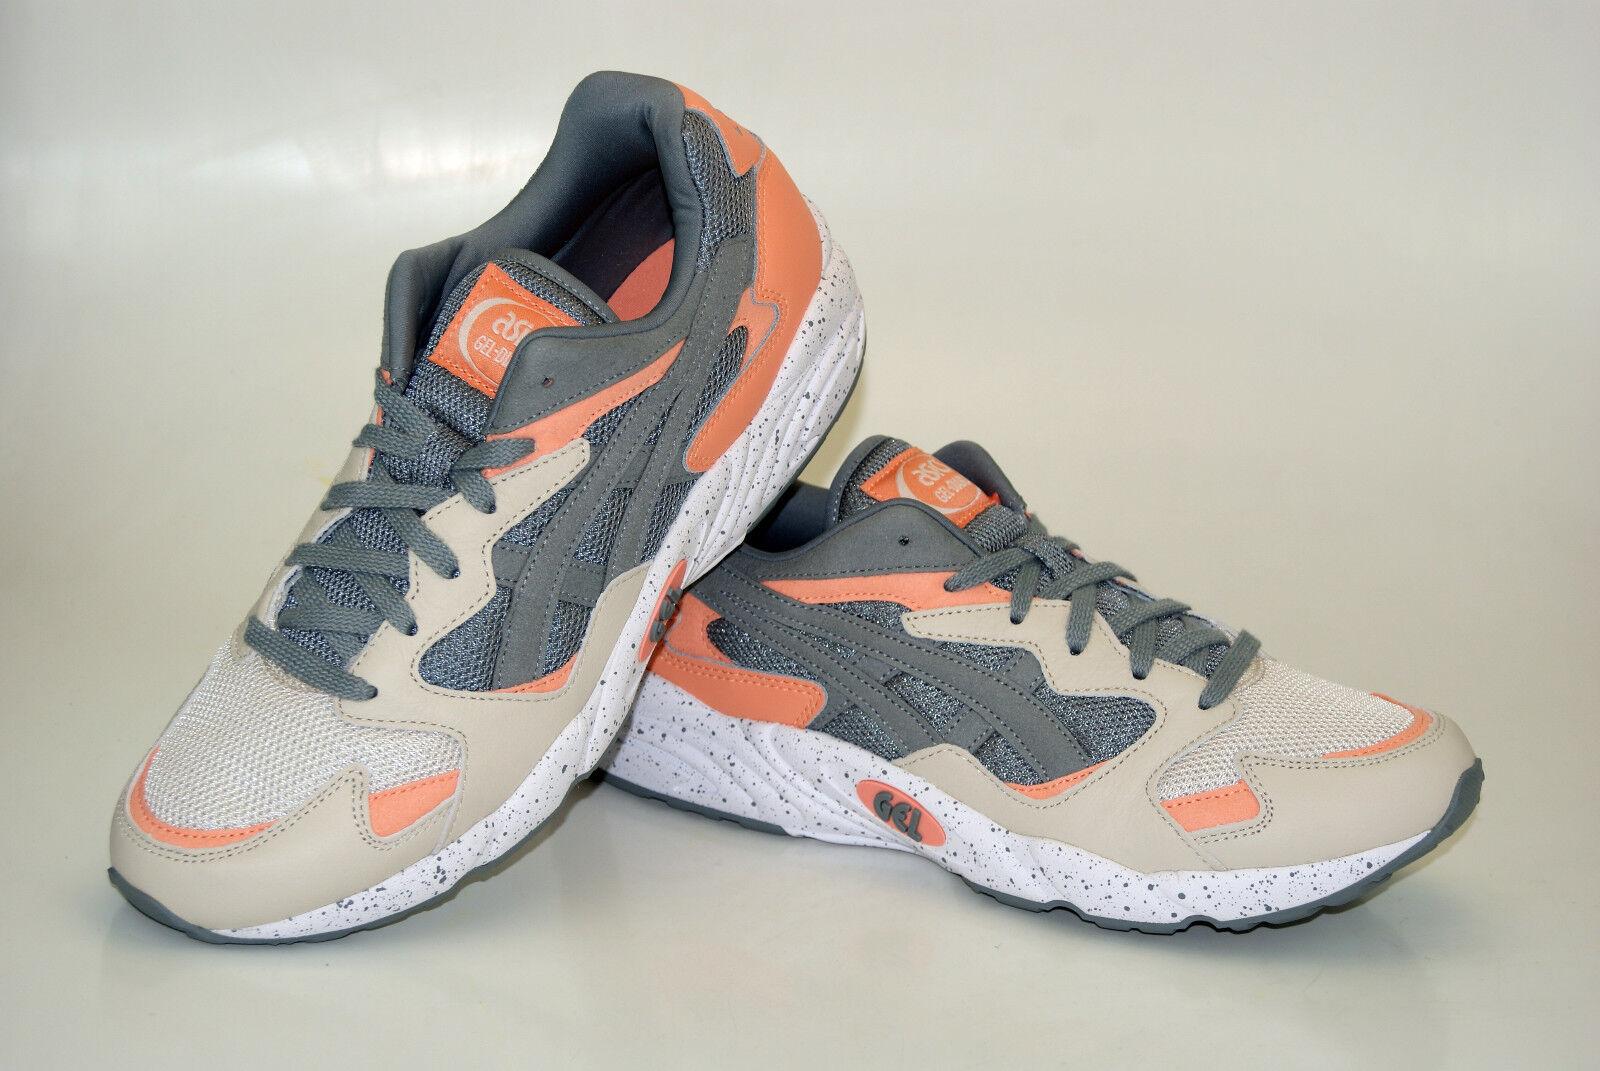 premium selection d12fe 95647 ... Asics Tiger Tiger Tiger Gel Diablo Chaussures / Baskets de Sport Hommes  H809L-1111 1c6460